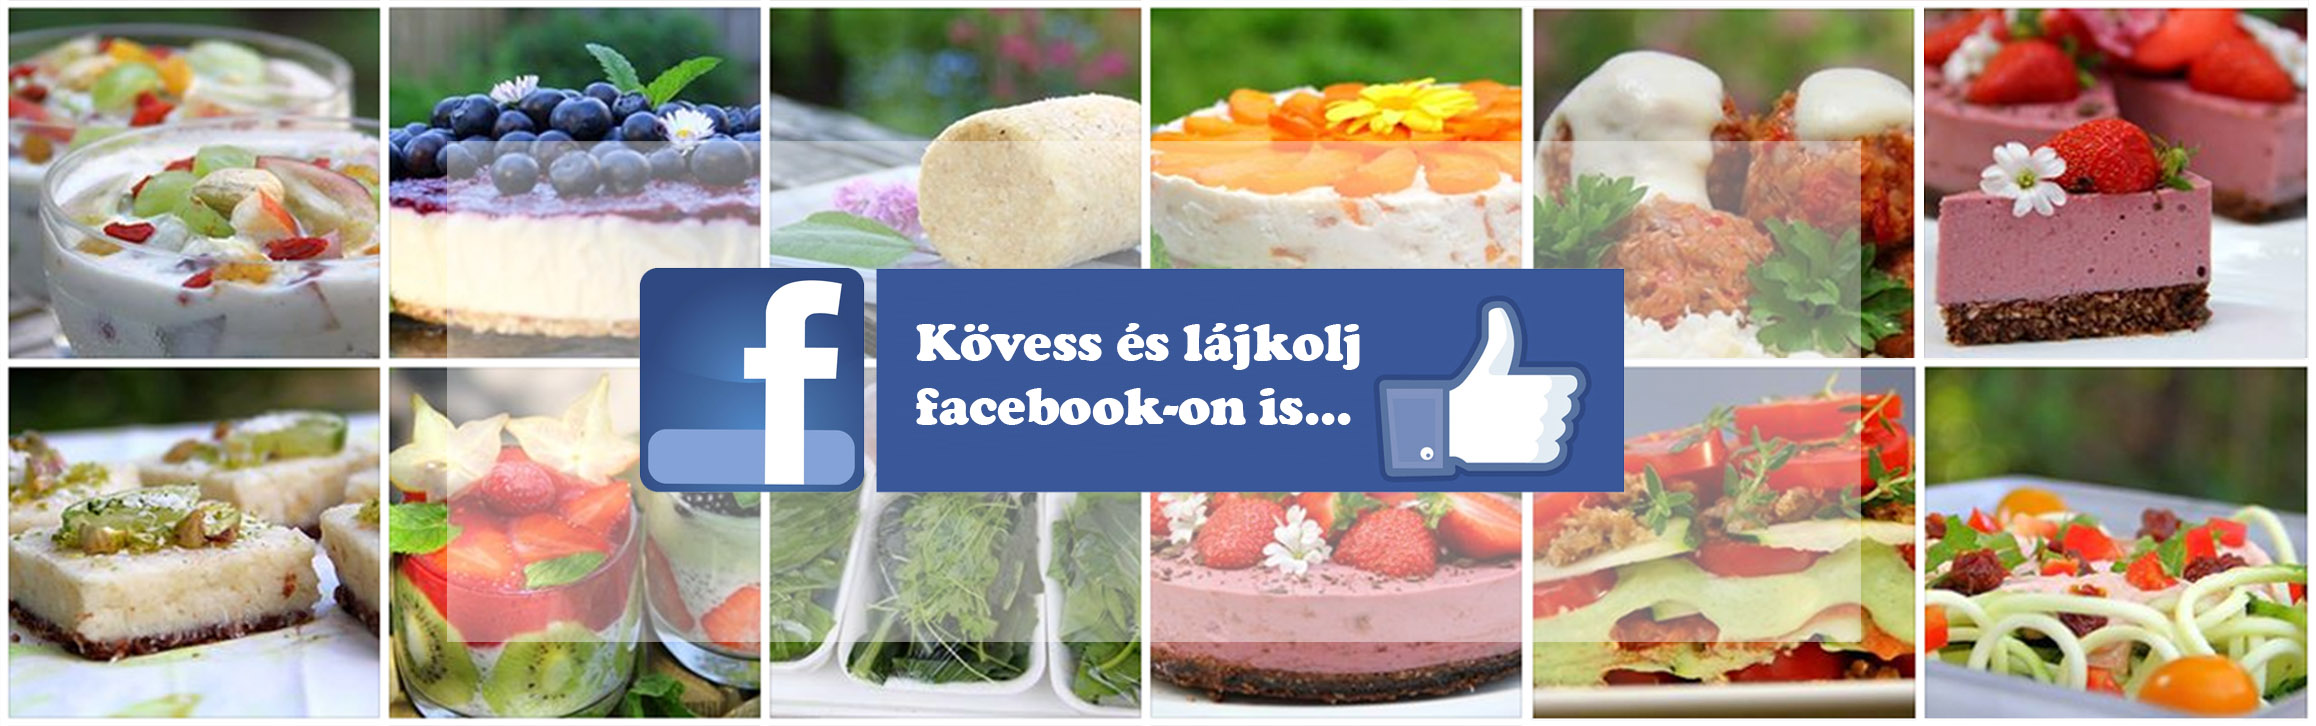 kovess_facebookon_2